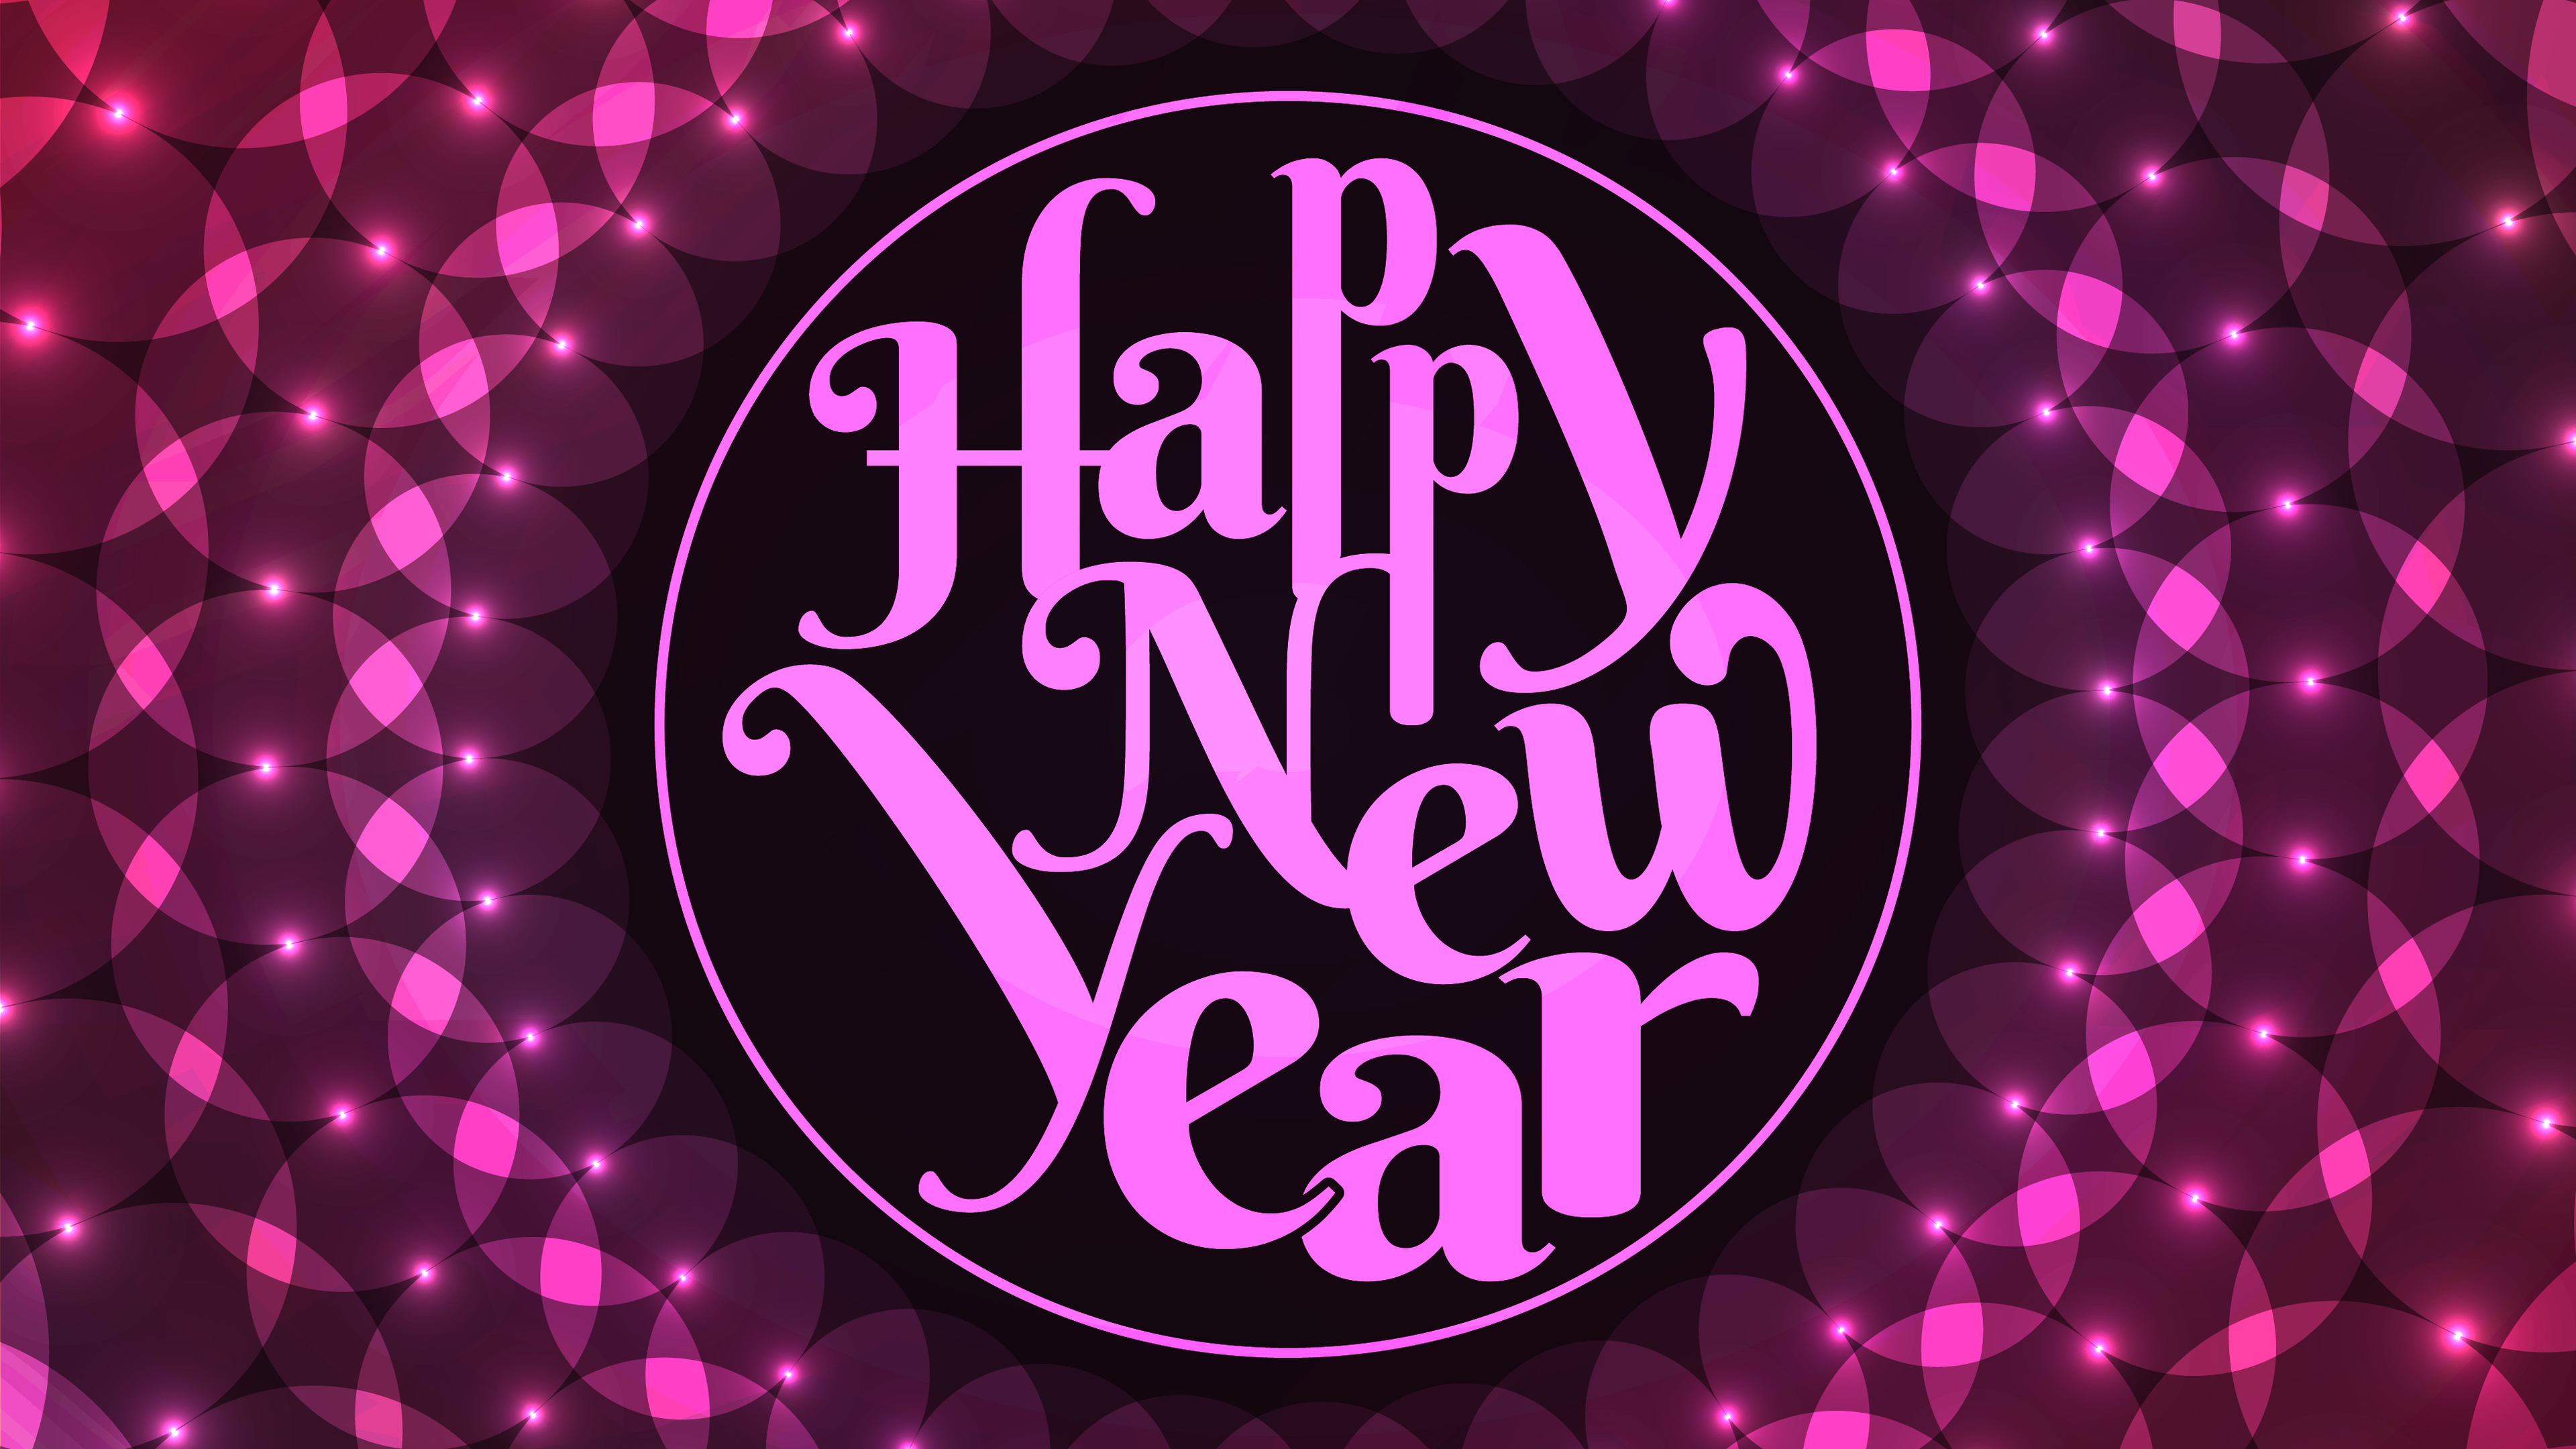 happy new year 4k 1543946575 - Happy New Year 4k - hd-wallpapers, happy new year 2019 wallpapers, celebrations wallpapers, abstract wallpapers, 4k-wallpapers